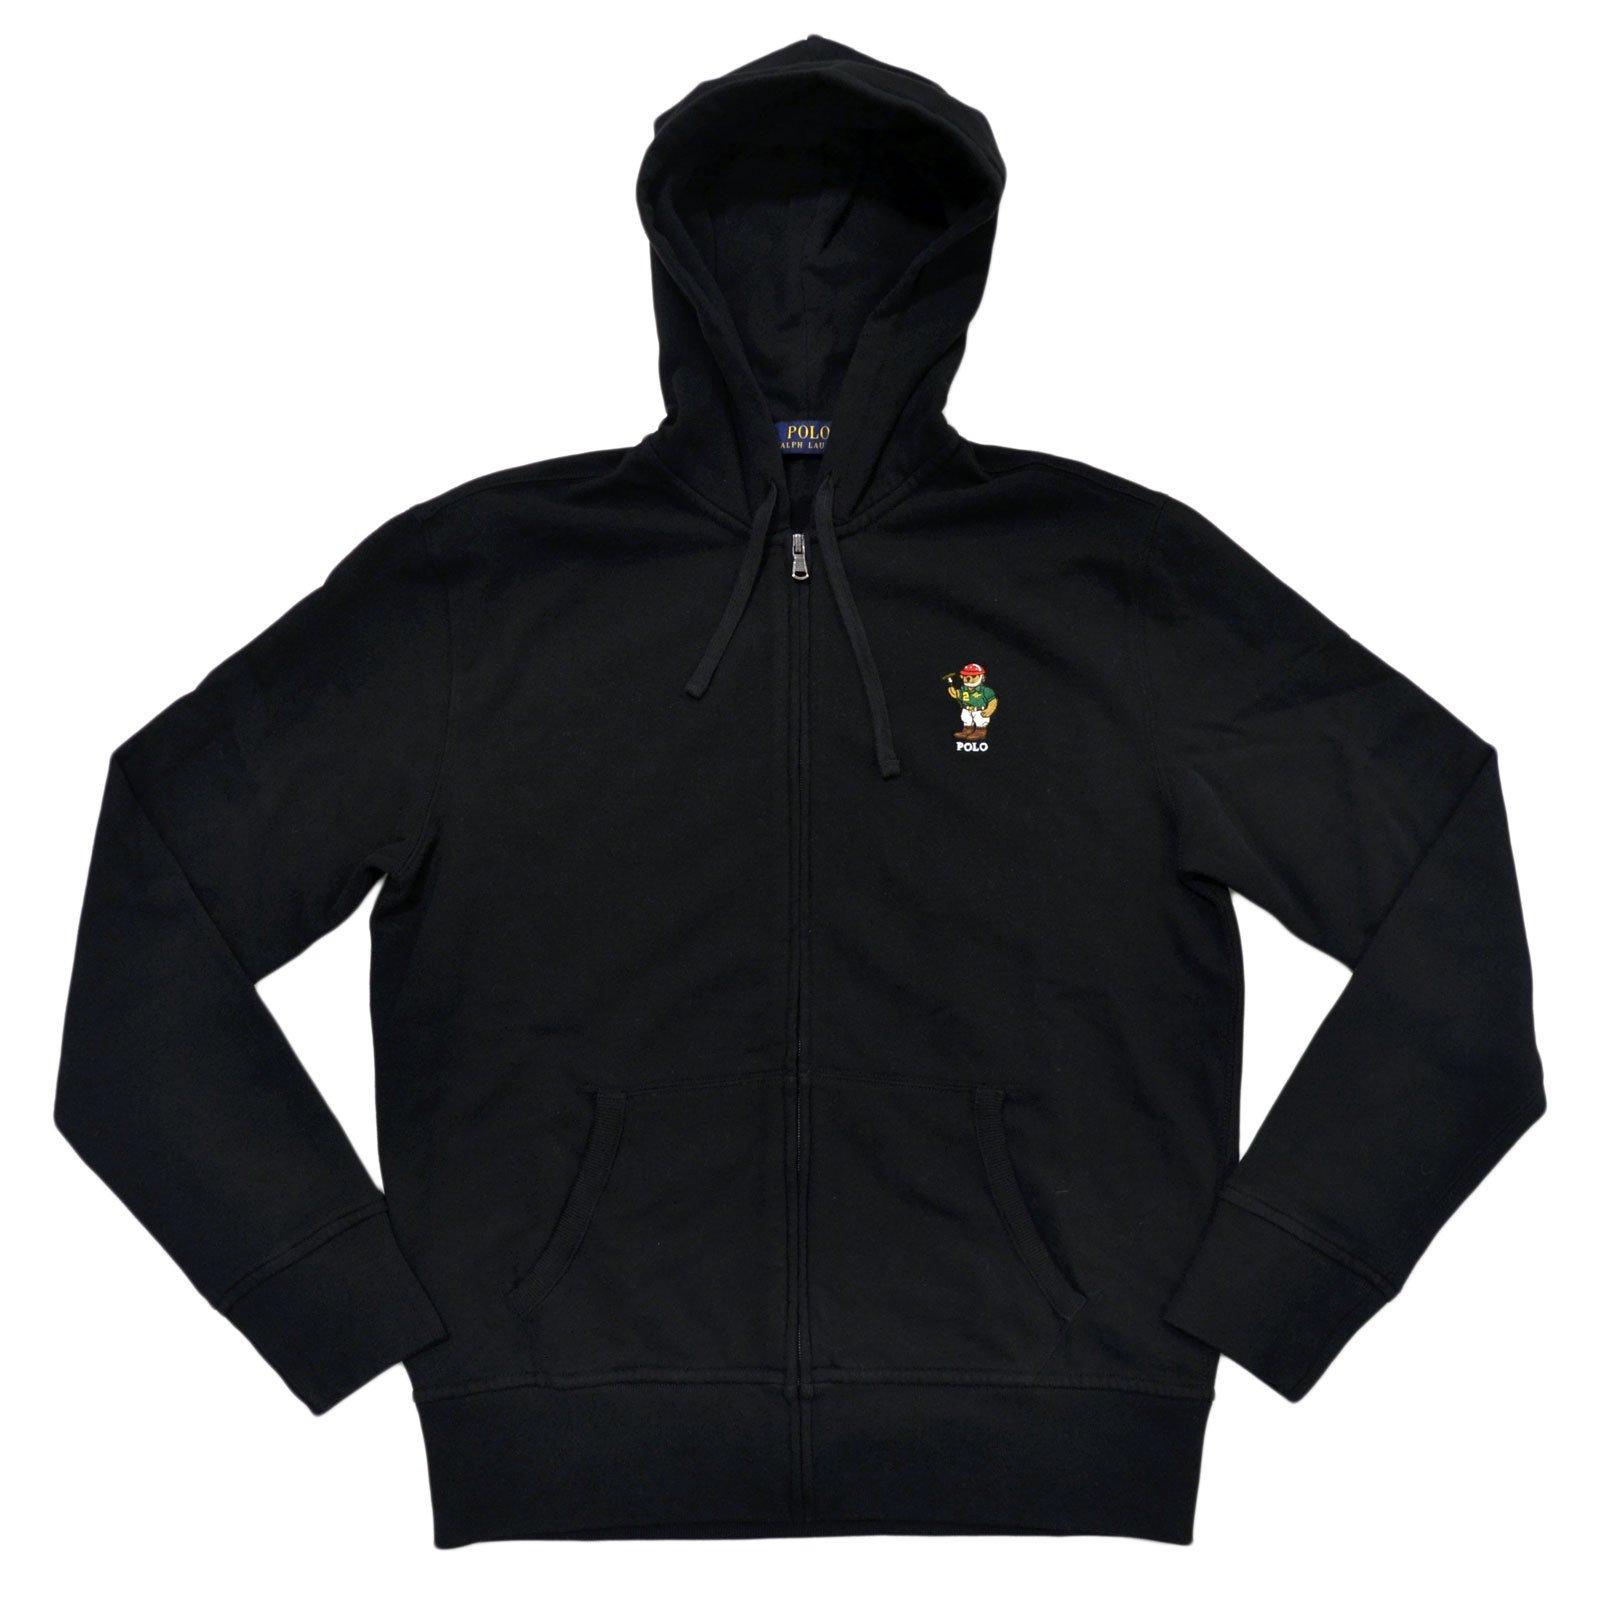 Polo Ralph Lauren Classic Full-Zip Fleece Hooded Sweatshirt with Bear Logo, BLACK (M)